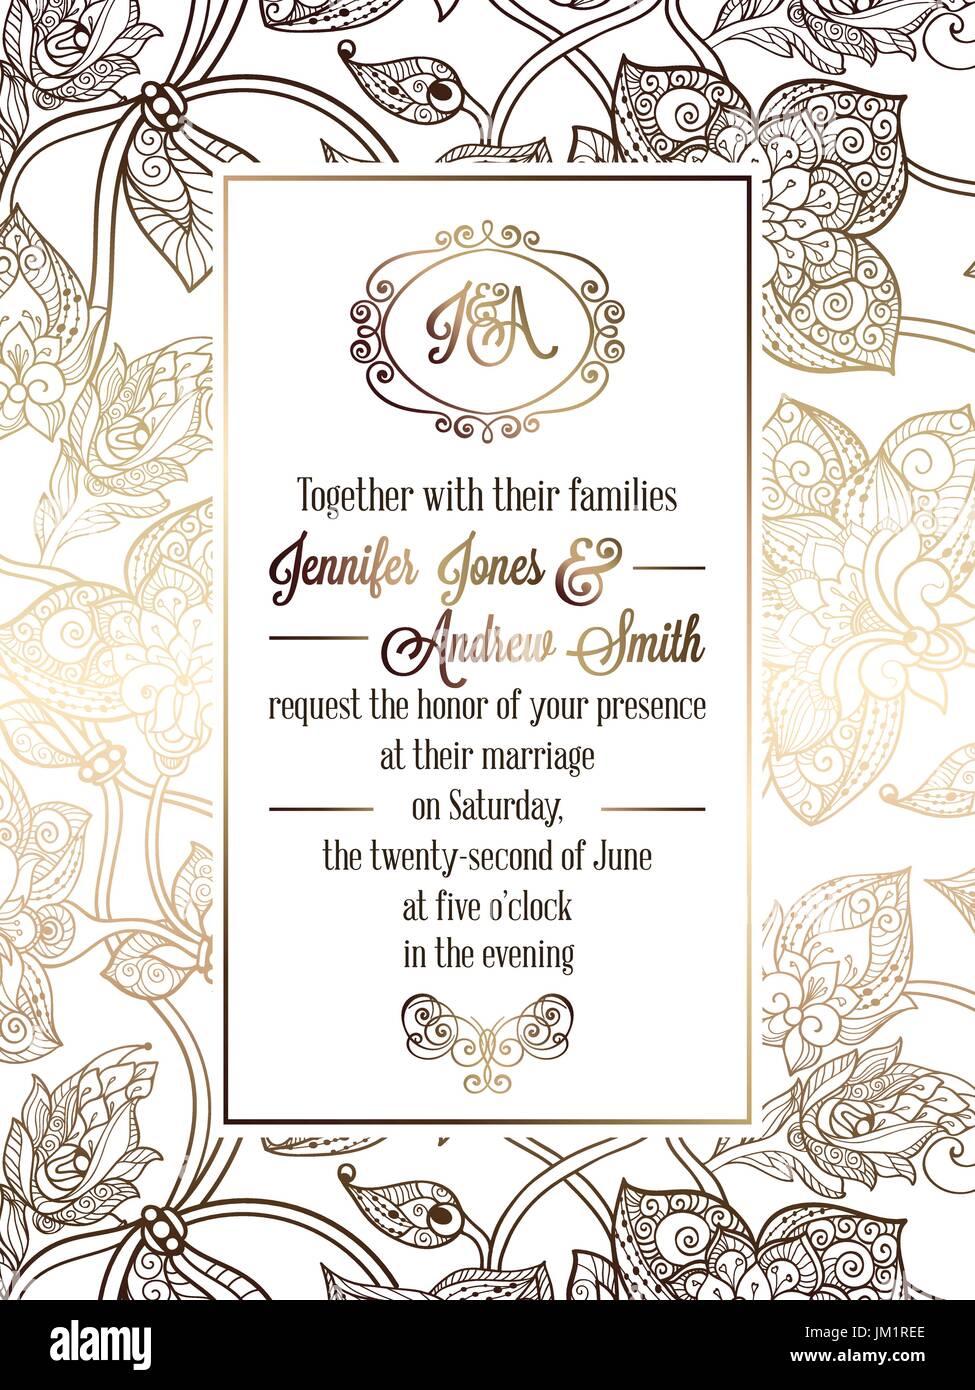 Vintage baroque style wedding invitation card template elegant vintage baroque style wedding invitation card template elegant formal design with damask background traditional decoration for wedding gold on whi stopboris Choice Image